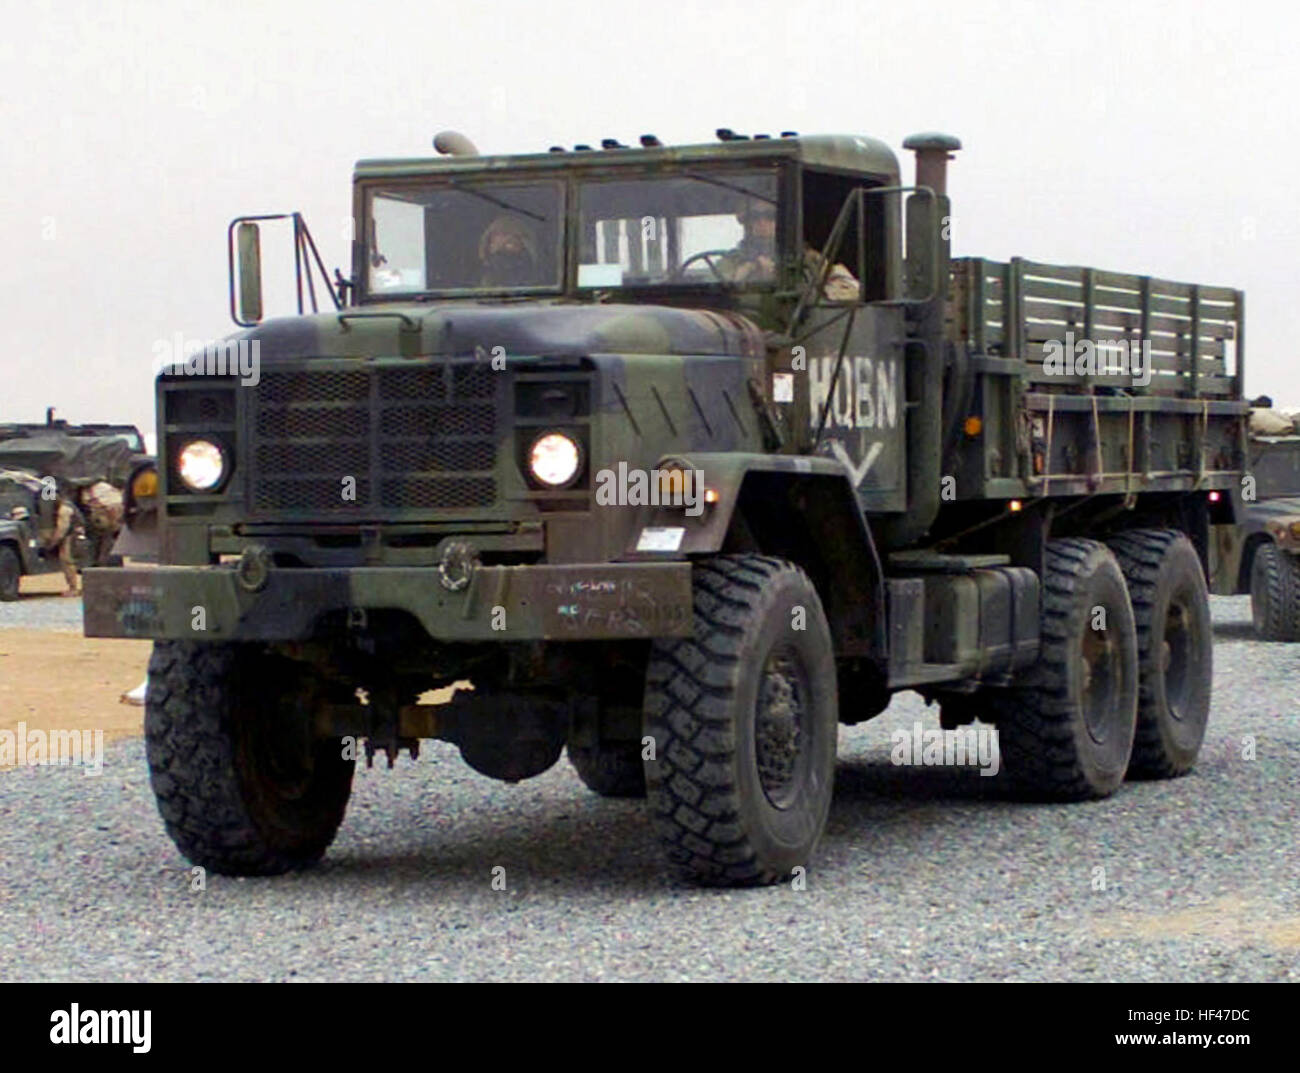 A US Marine Corps (USMC) M923 (6X6) 5-ton cargo truck ...